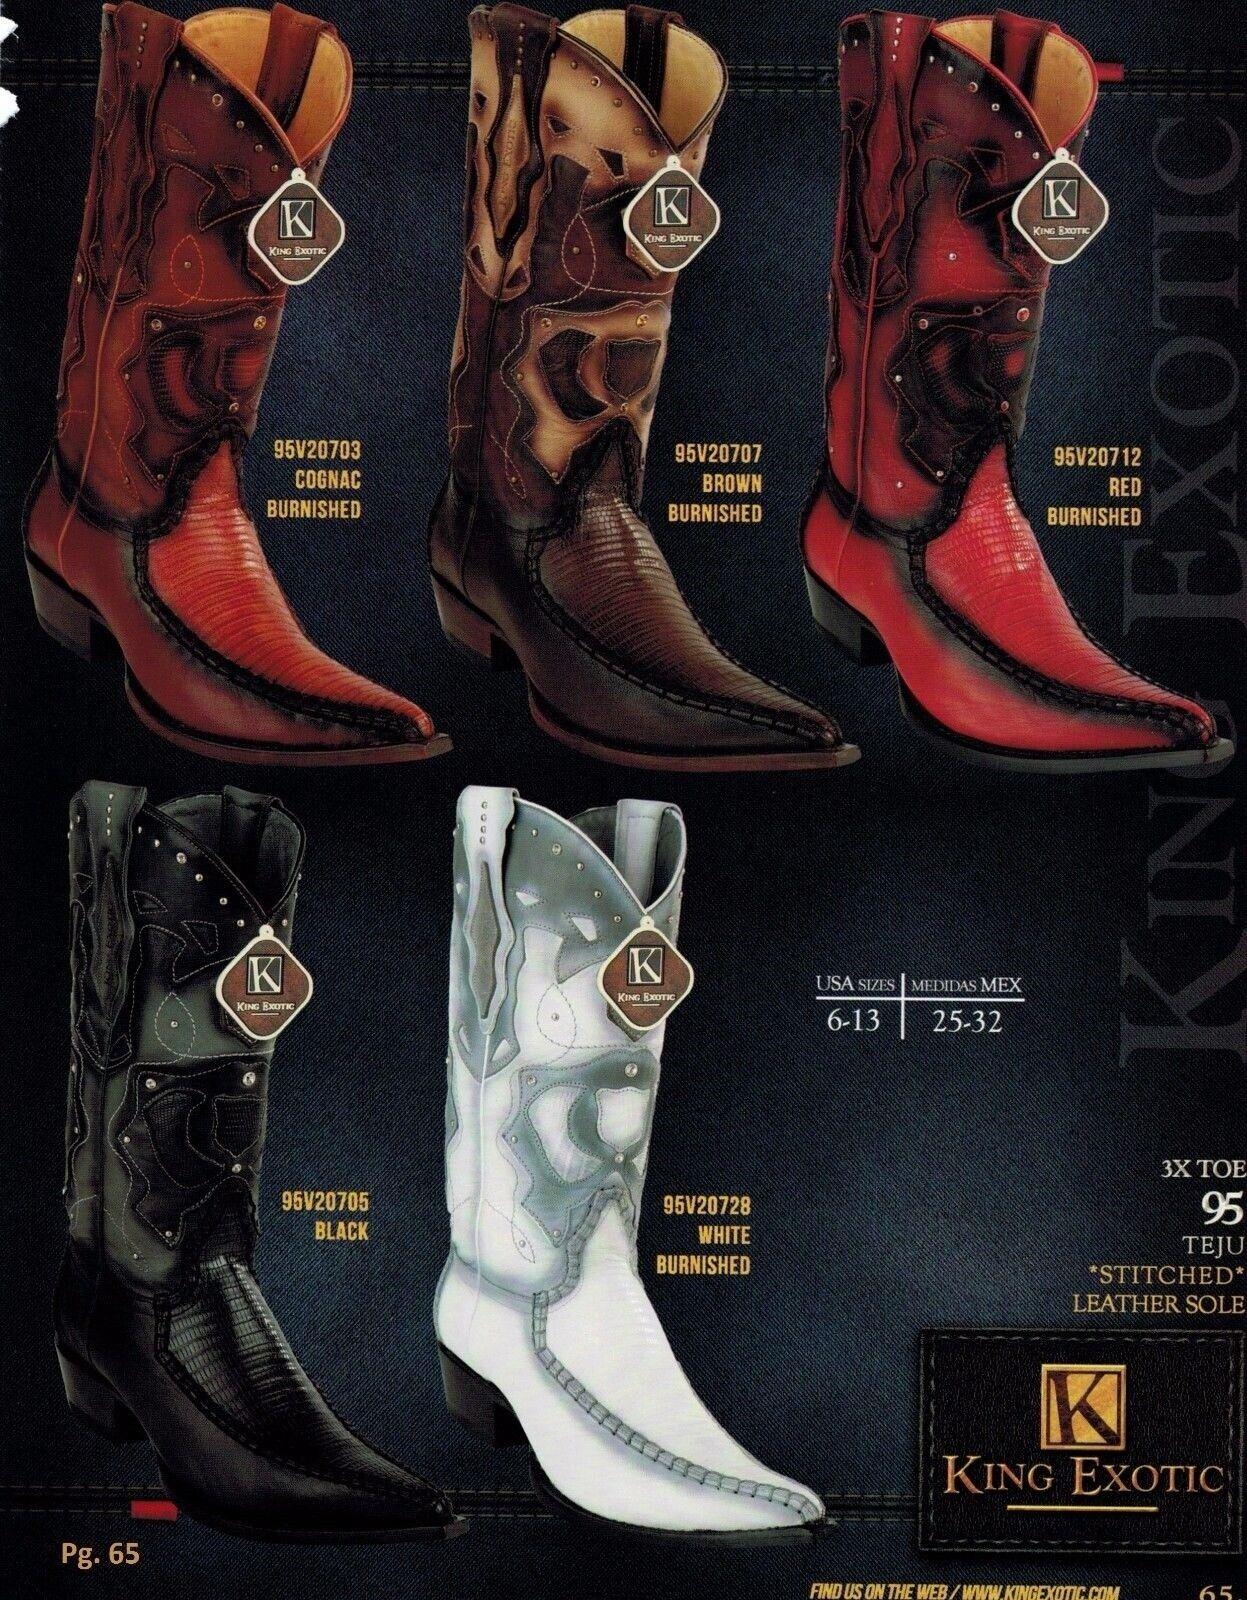 King Exotic Para hombre XXX-toe XXX-toe XXX-toe botas de vaquero occidental Genuino Teju lagarto 6ff143